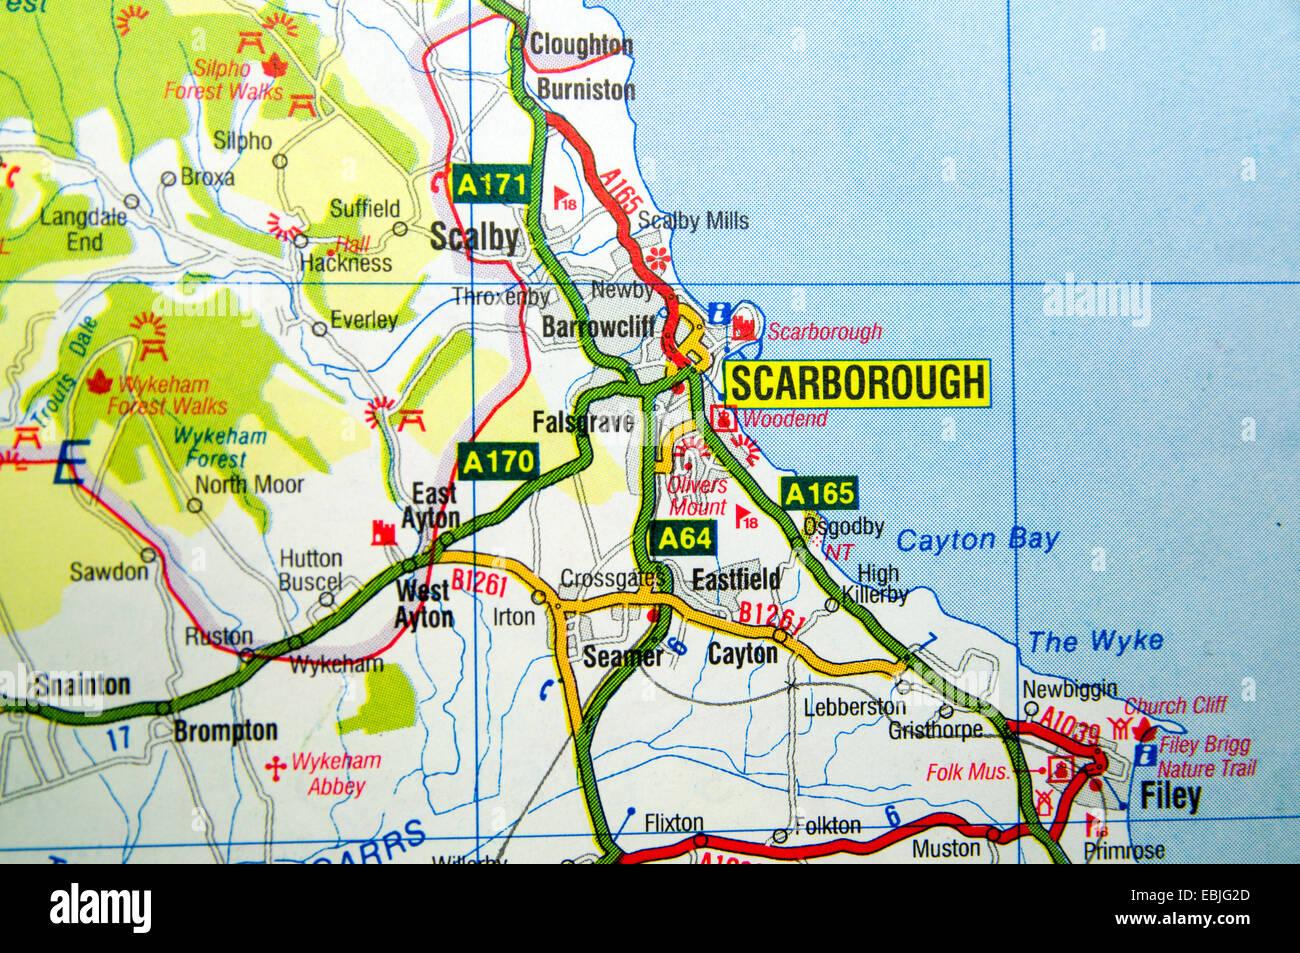 Road Map of Scarborough, England Stock Photo: 76010437   Alamy